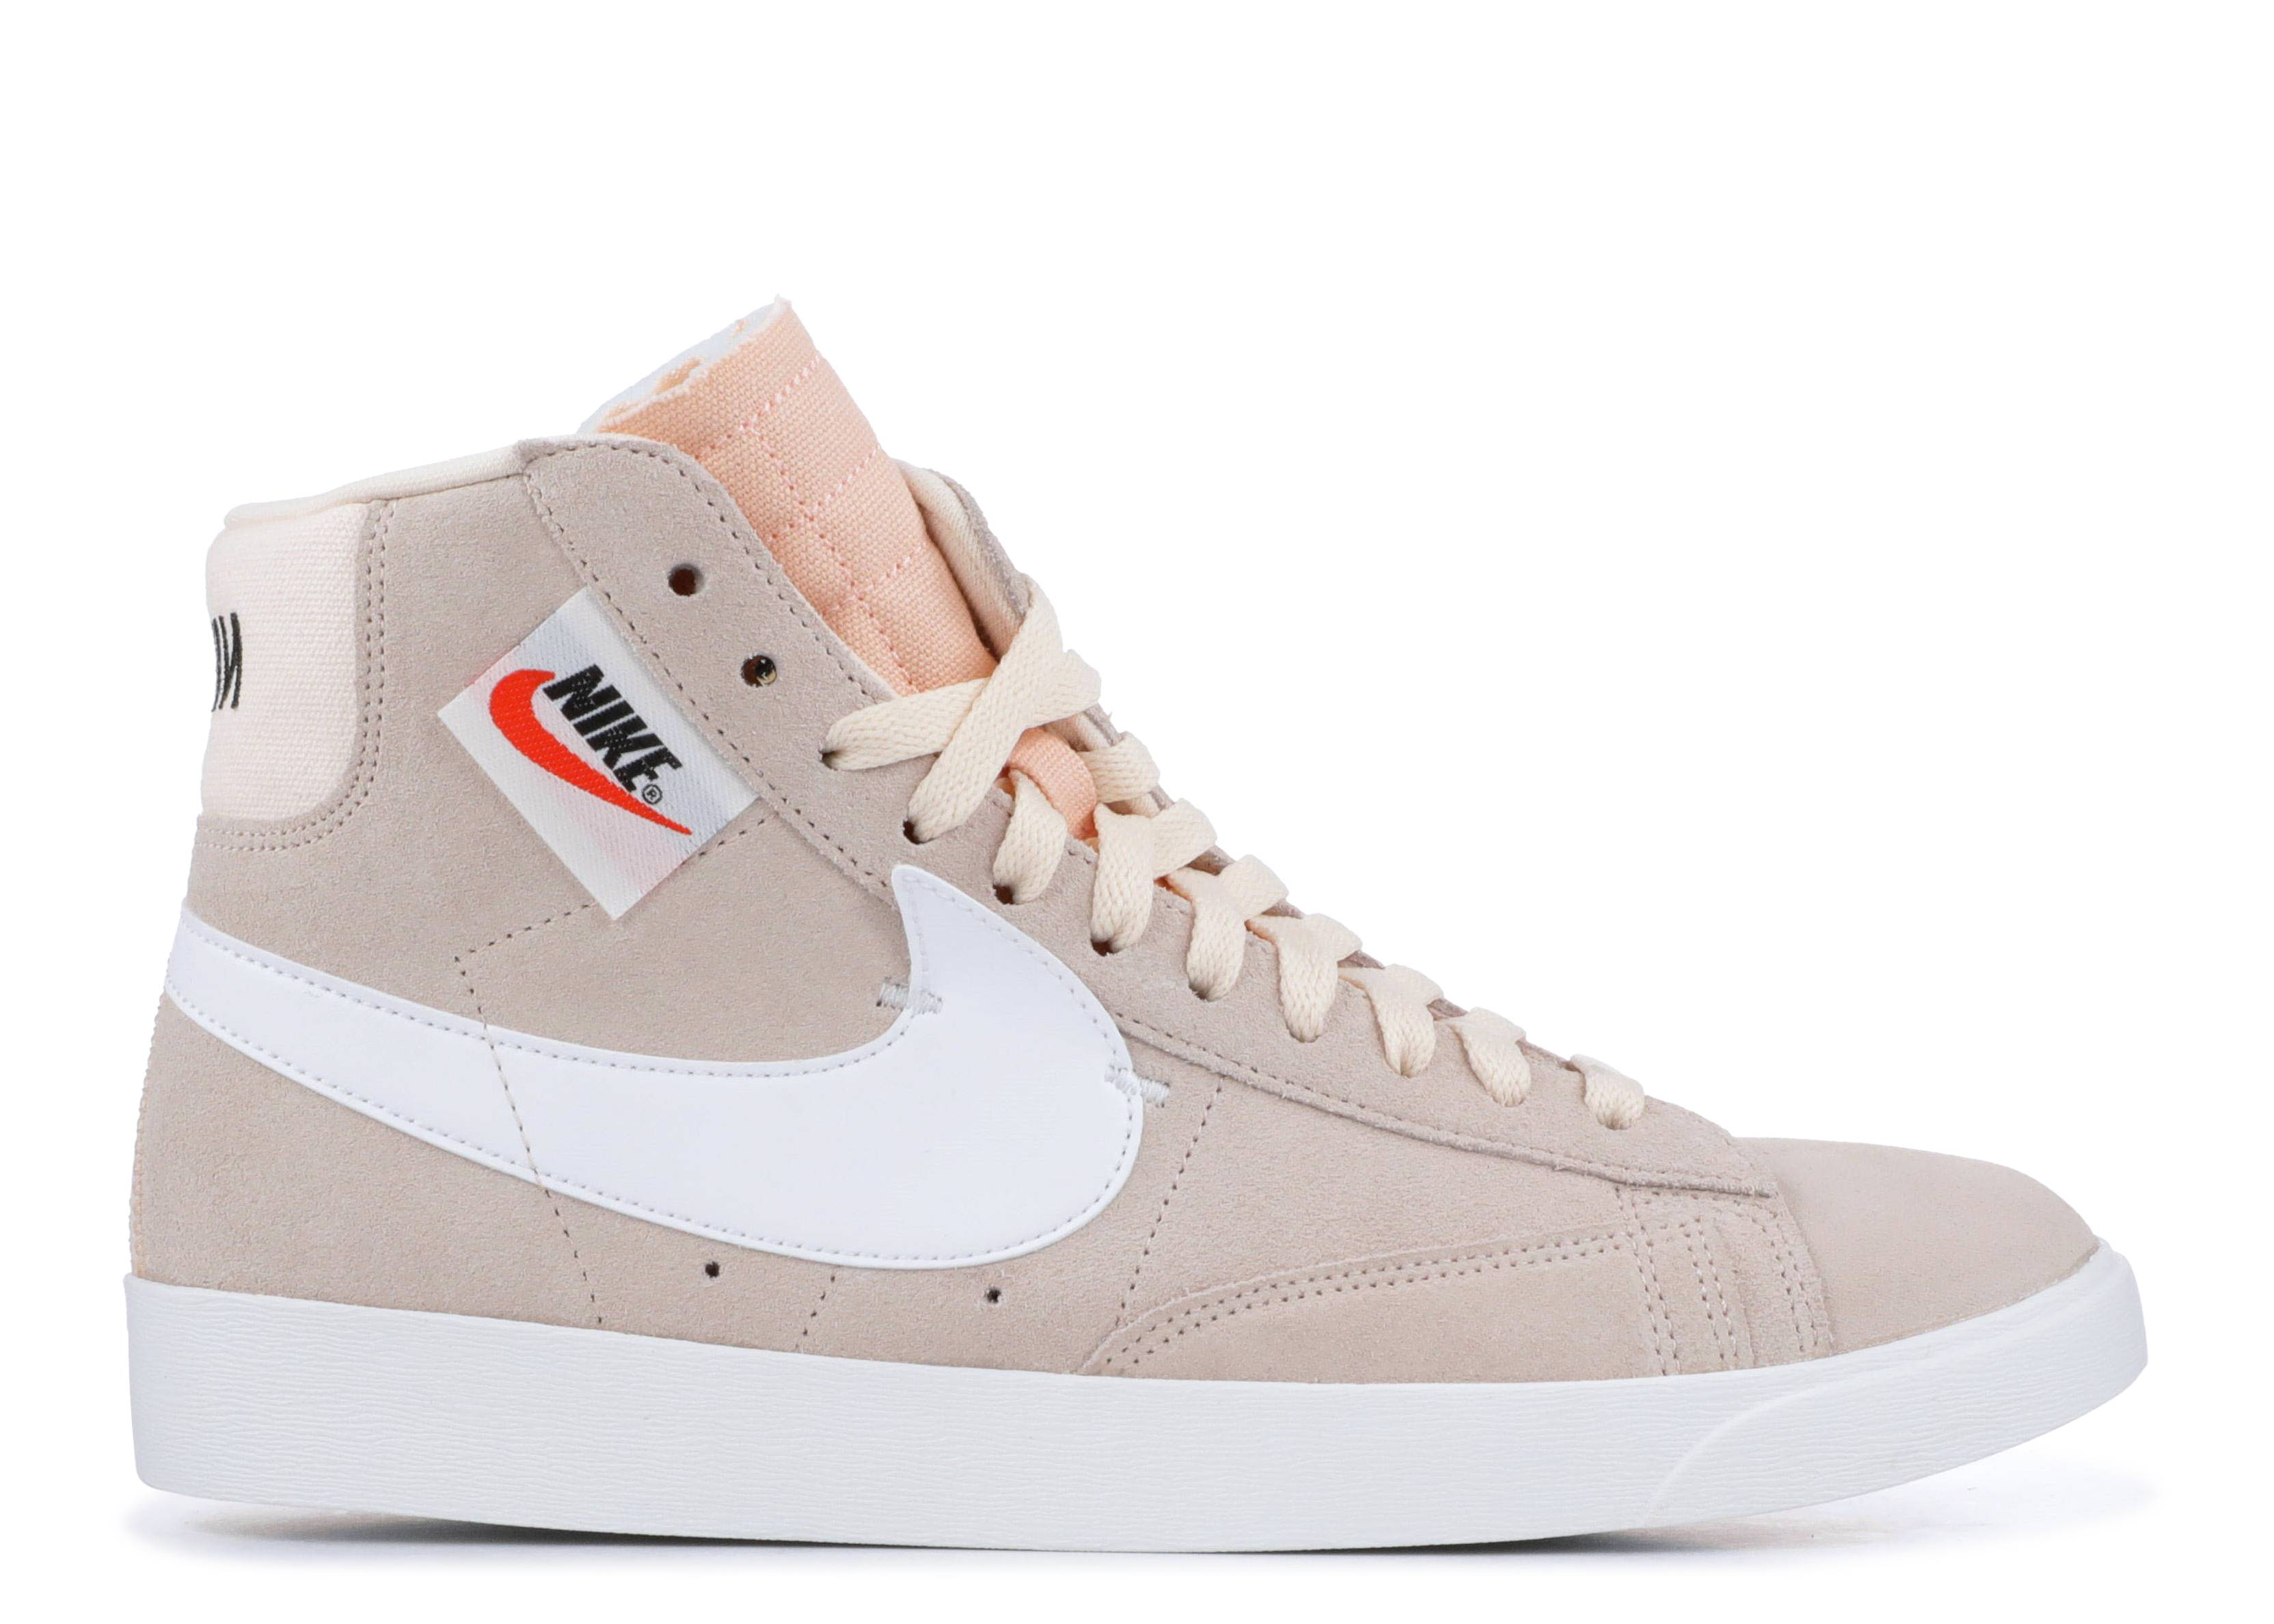 c168d9ea07b Wmns Nike Blazer Mid Rebel Guava Ice - Nike - bq4022 801 - guava ice ...